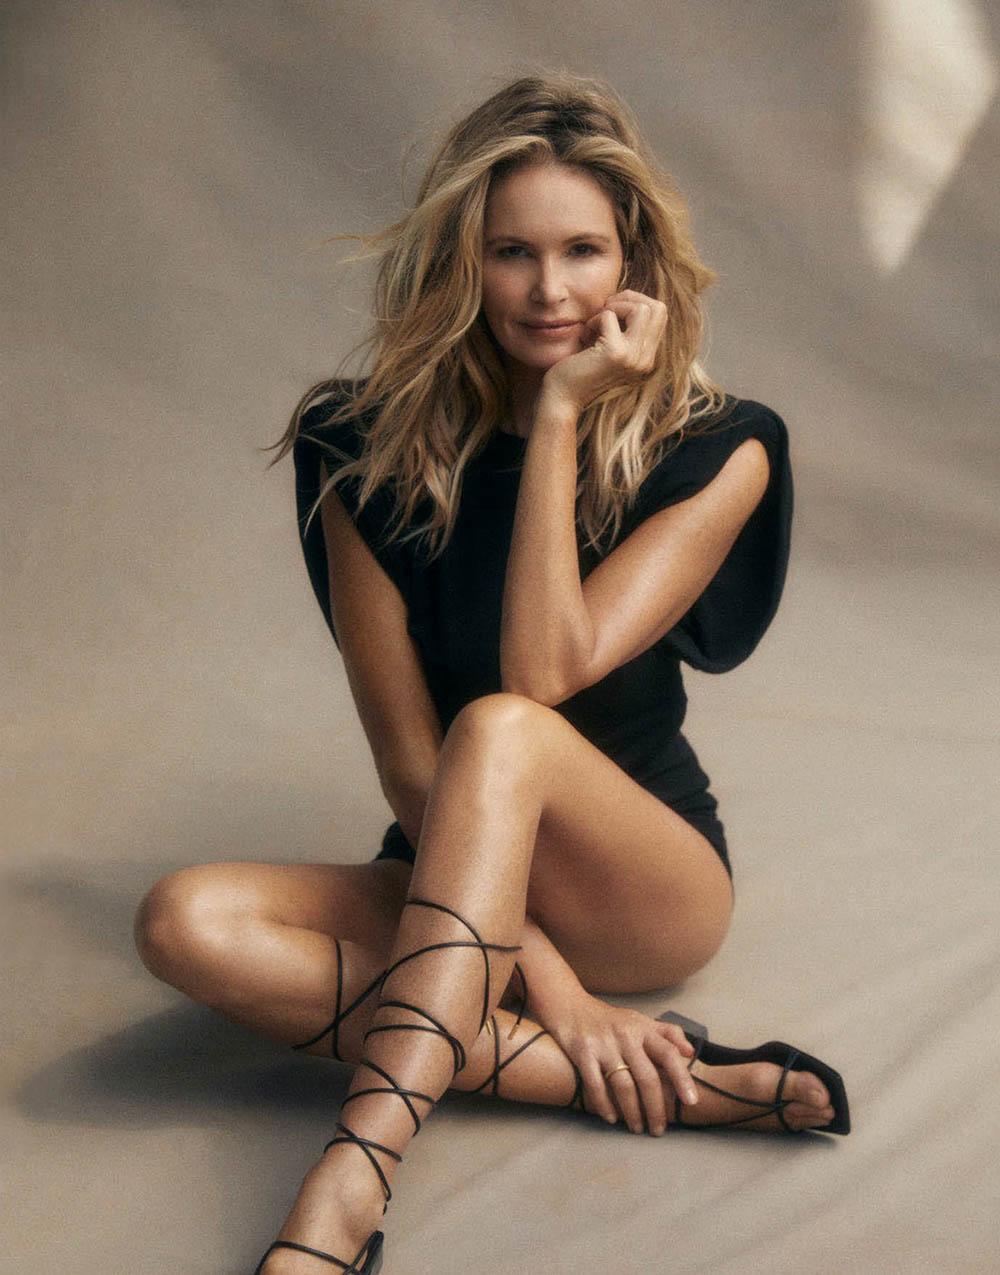 Elle Macpherson covers Harper's Bazaar Australia May 2020 by Darren McDonald